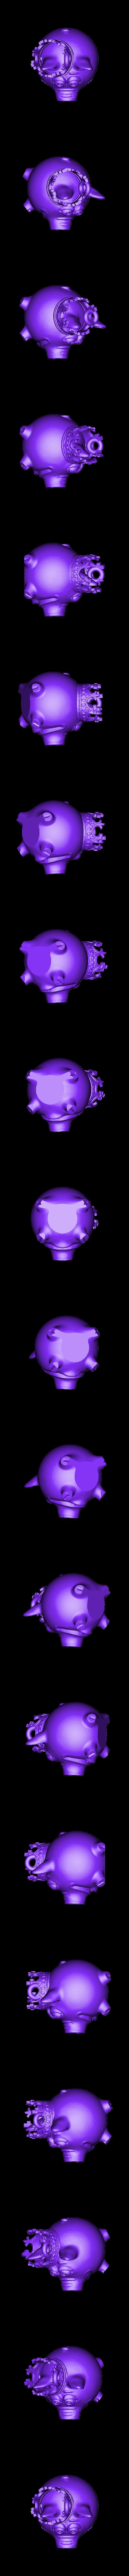 KingLES.stl Download free STL file Pig Royal Family • 3D printer model, shuranikishin